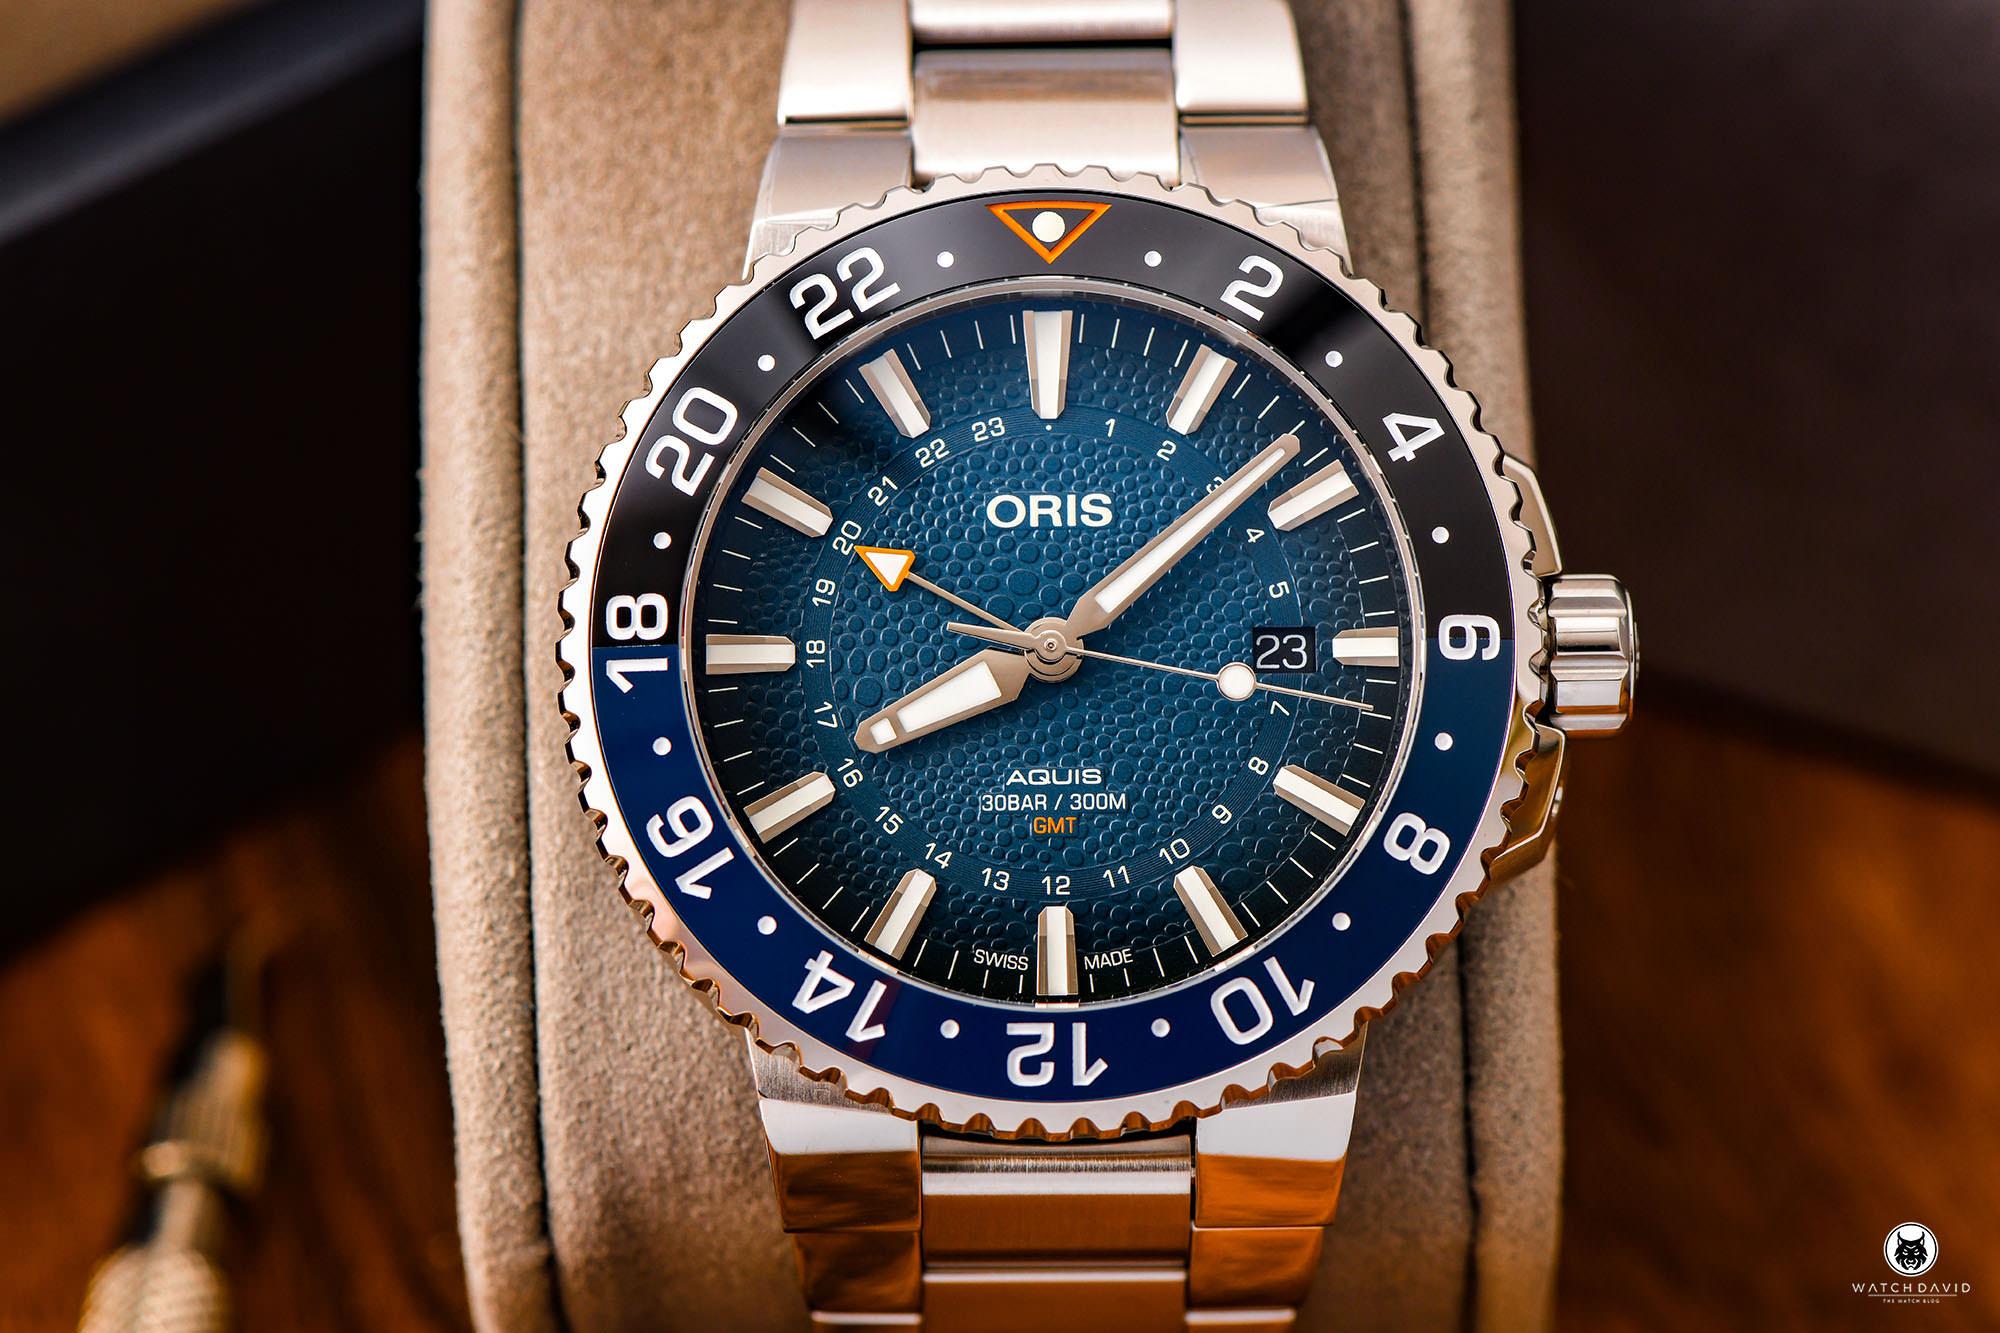 Oris Aquis Whale Shark Limited Edition